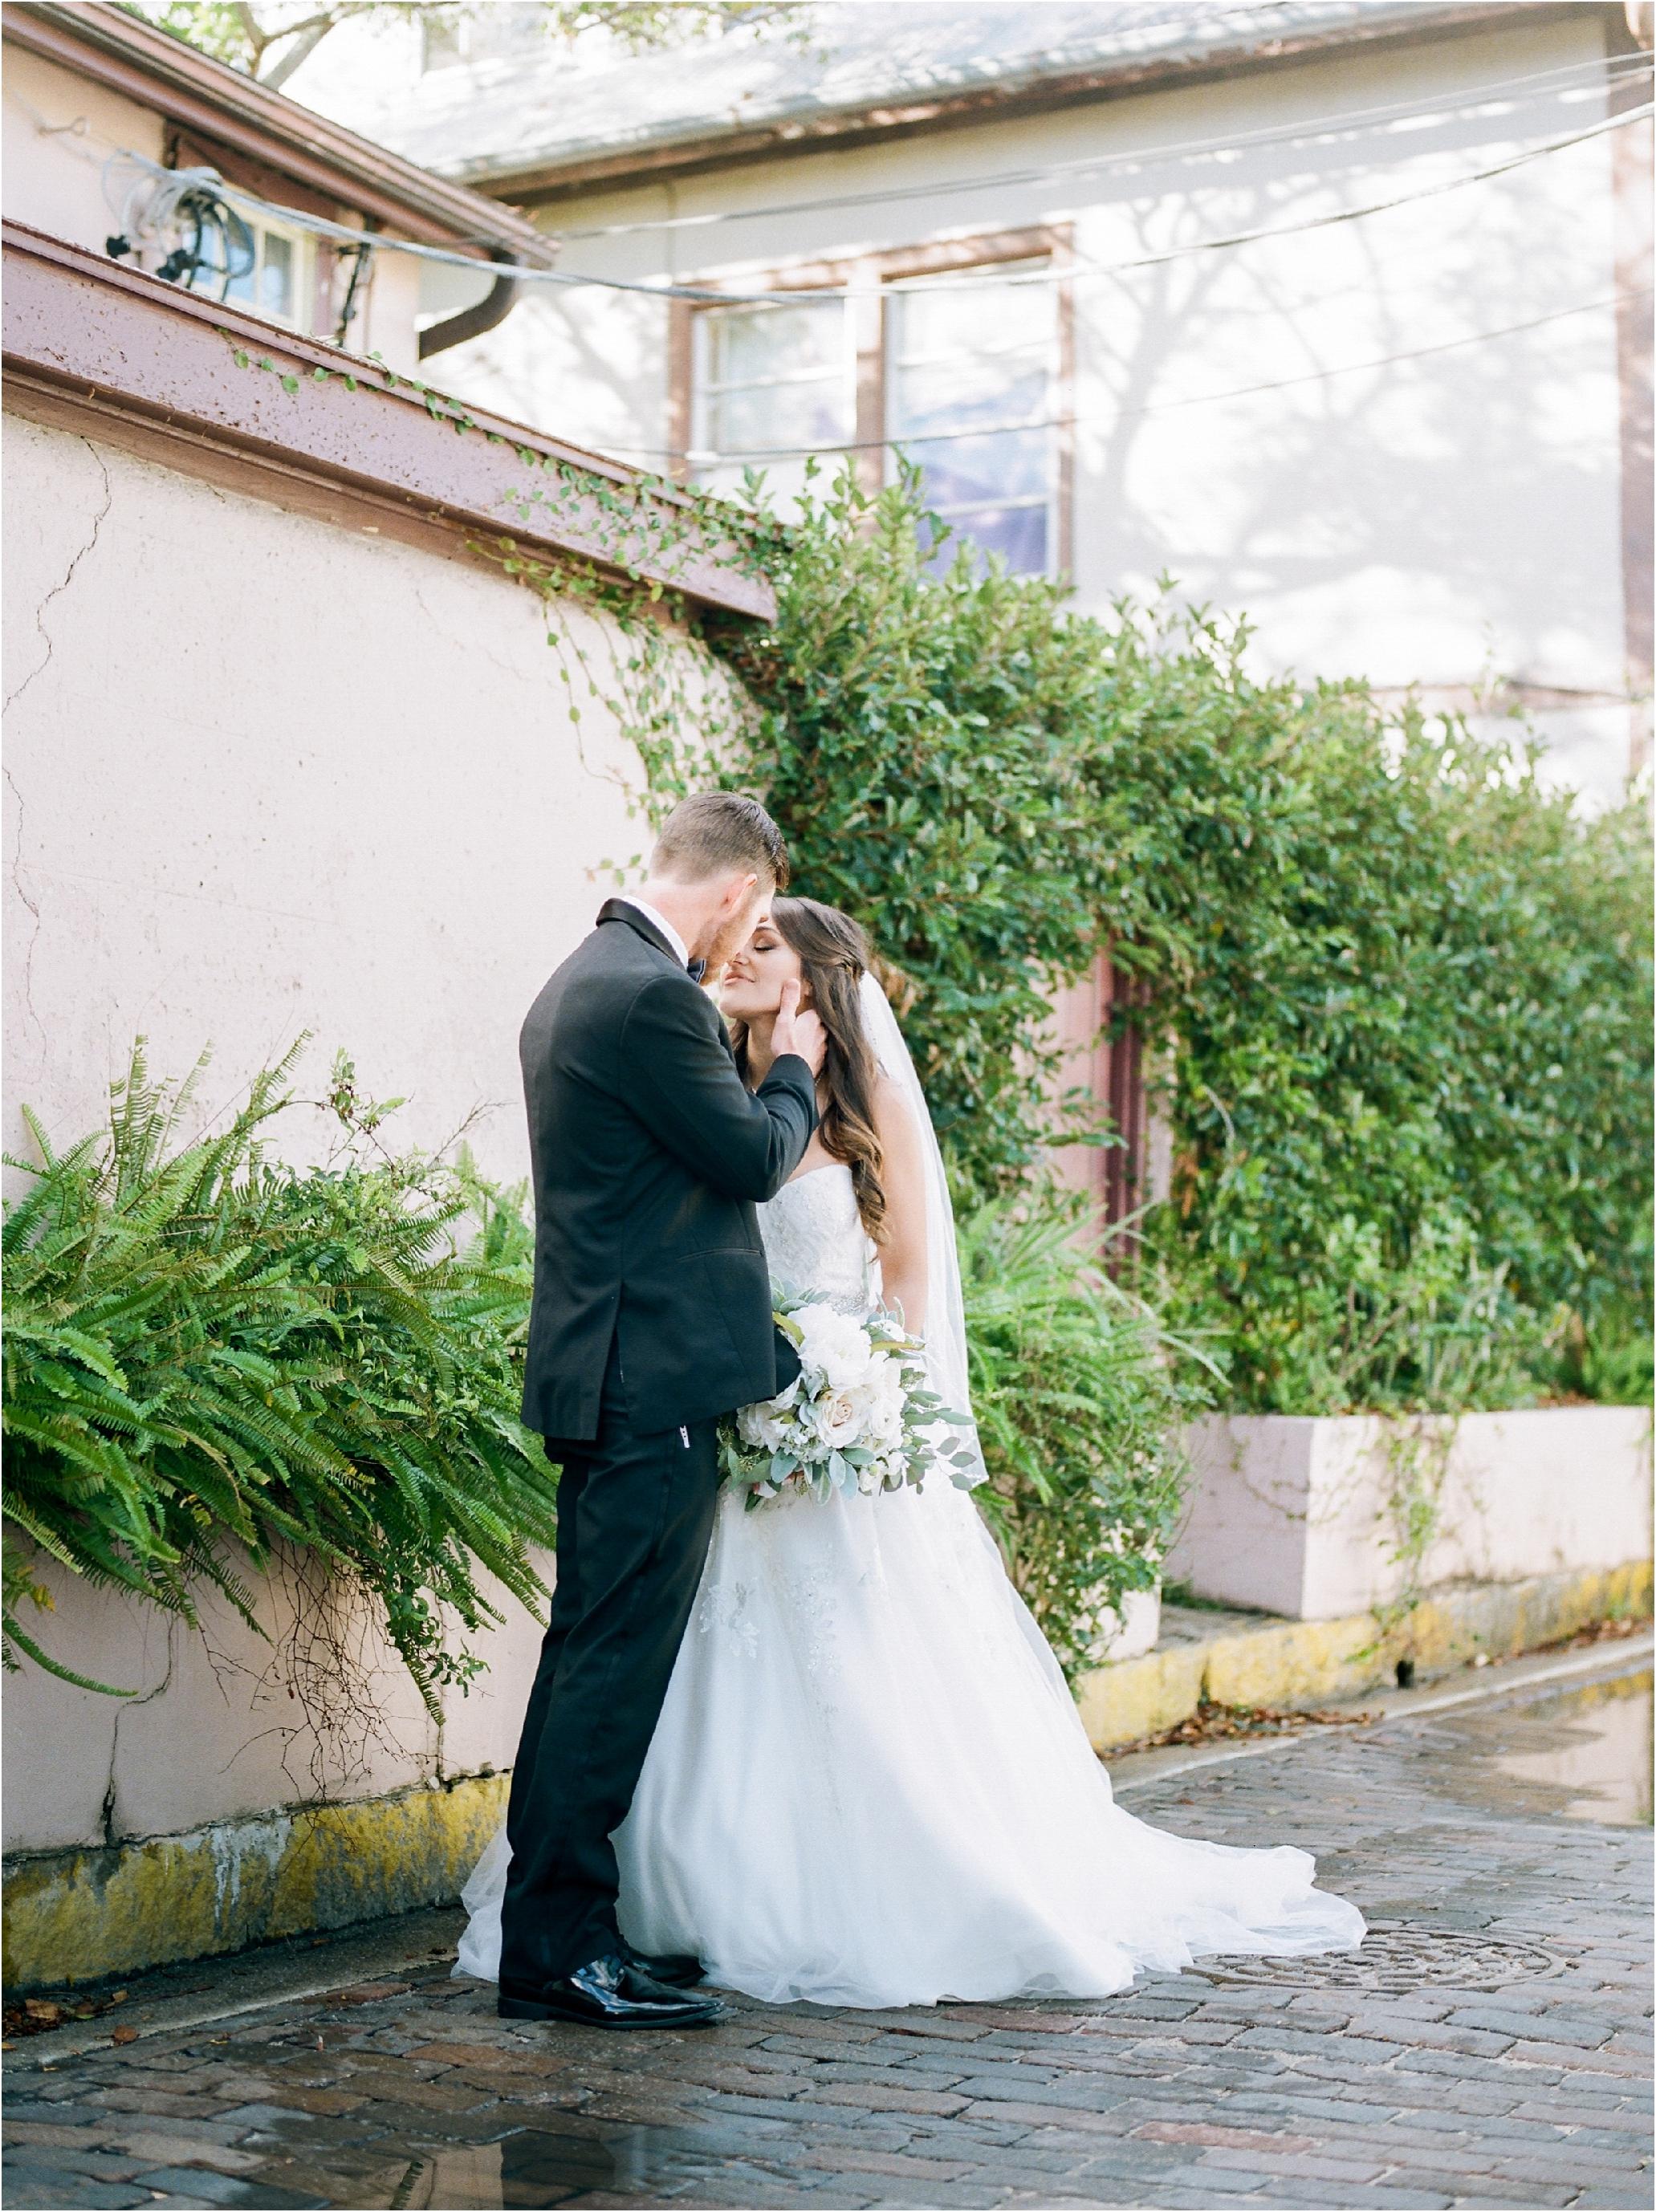 Lisa Silva Photography- Ponte Vedra Beach and Jacksonville, Florida Fine Art Film Wedding Photography- Wedding at The White Room Villa Blanca in St. Augustine, Florida_0038.jpg